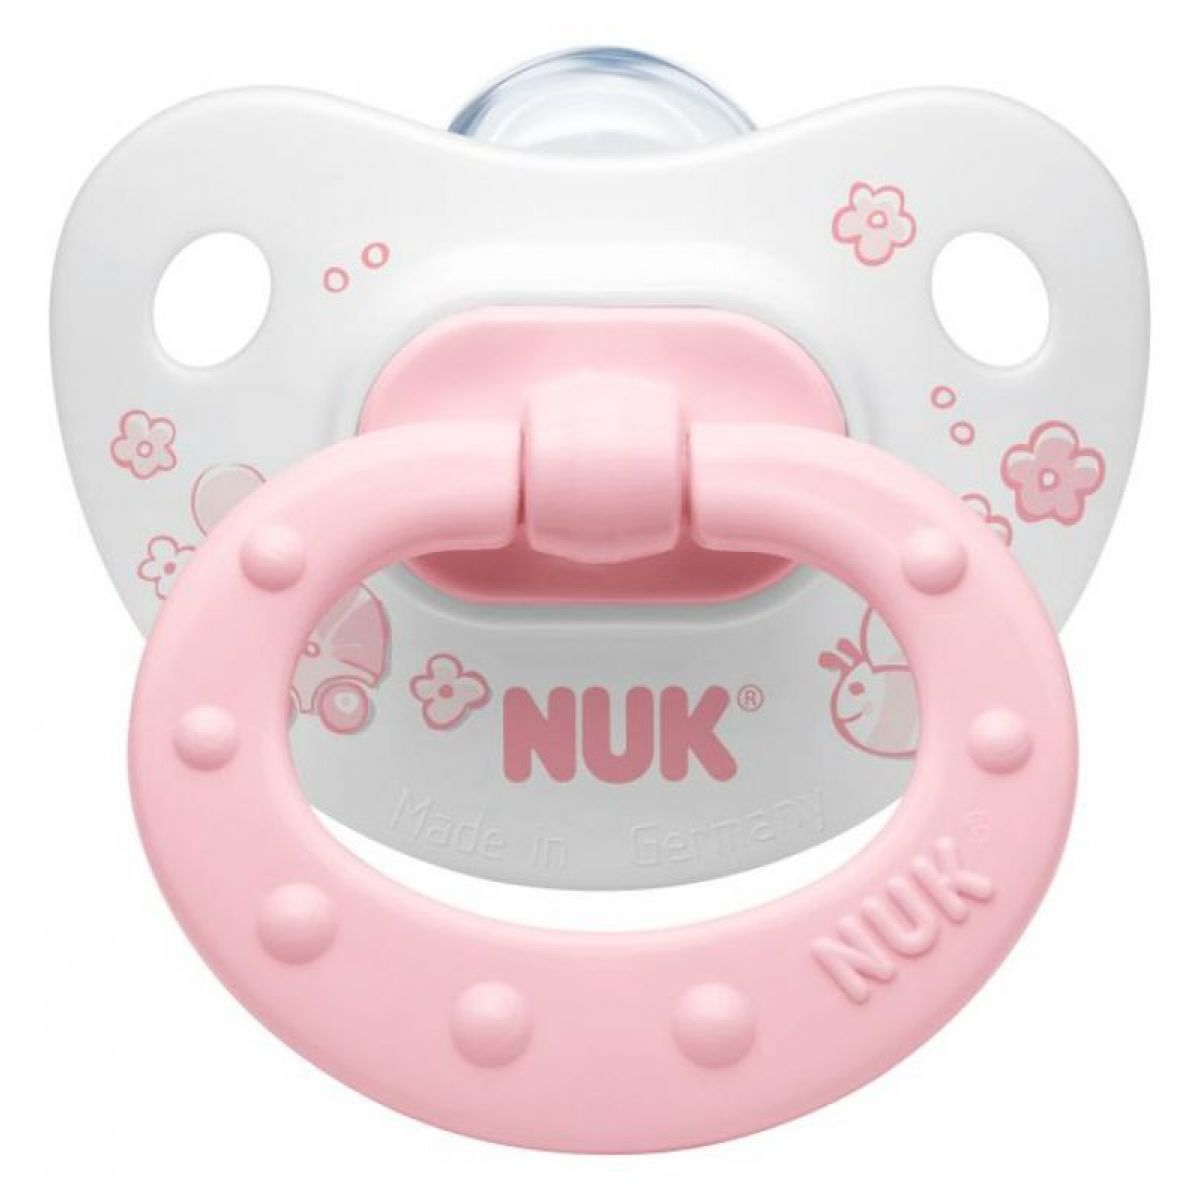 Nuk Dudlík Classic silikon růžový 0-6m